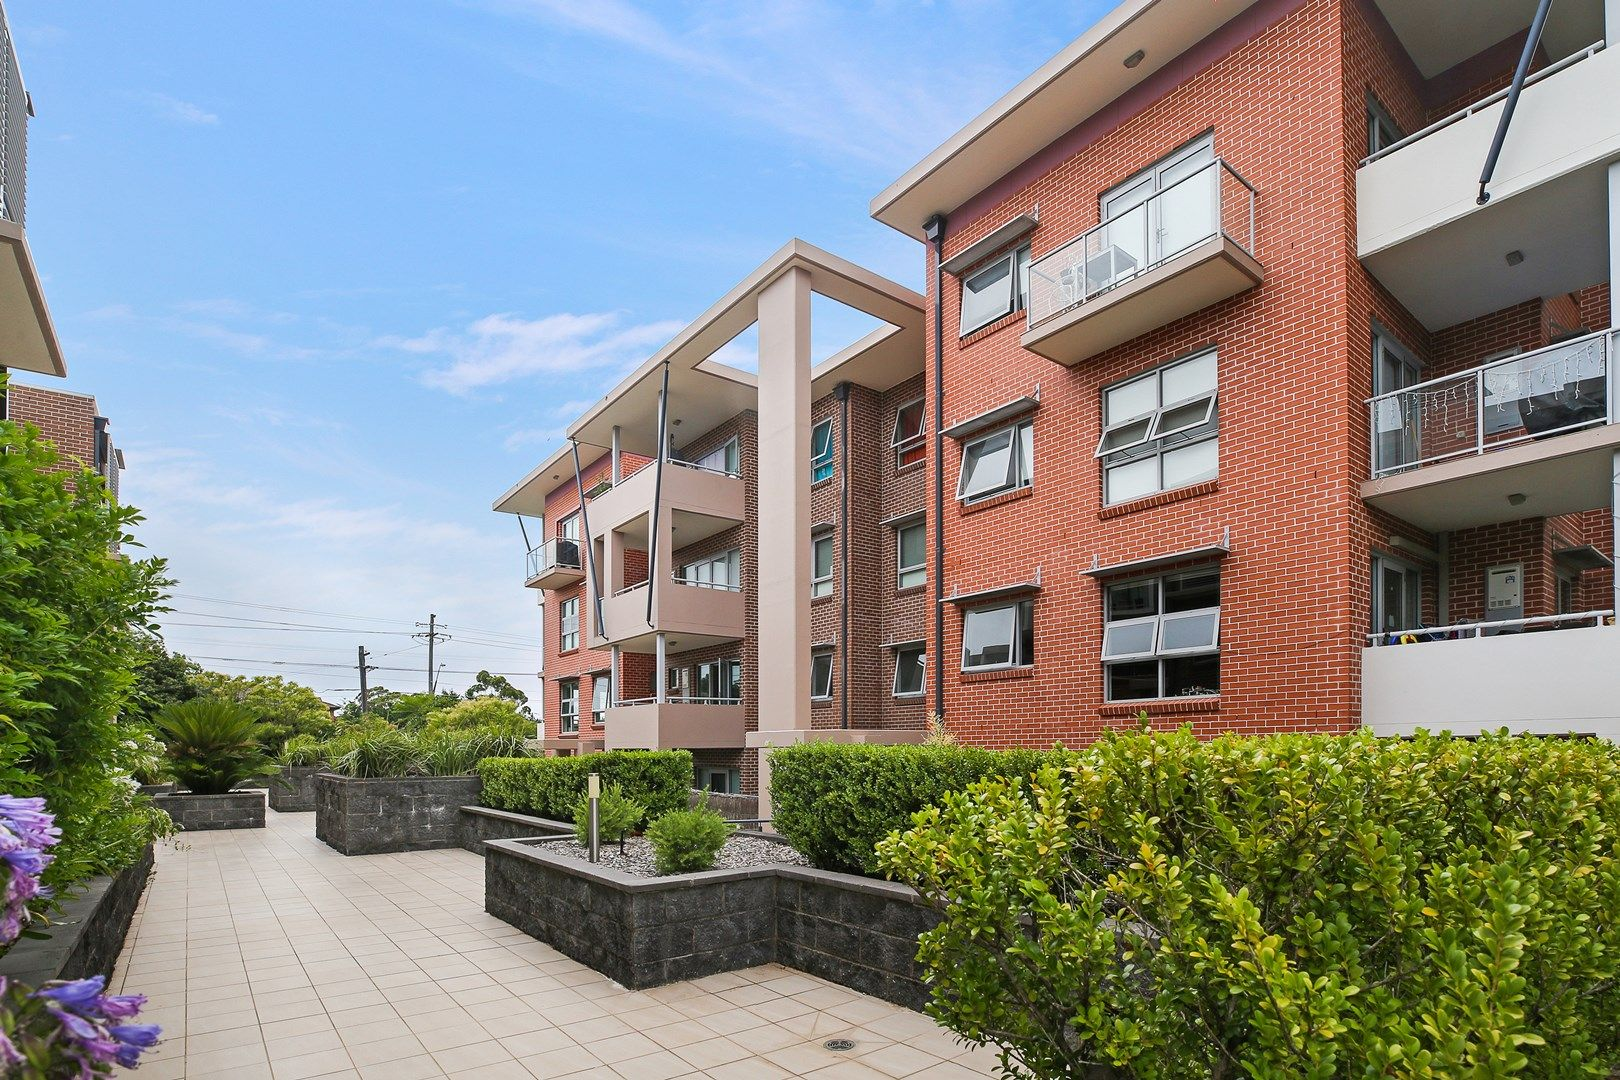 27/500 President Avenue, Sutherland NSW 2232, Image 1